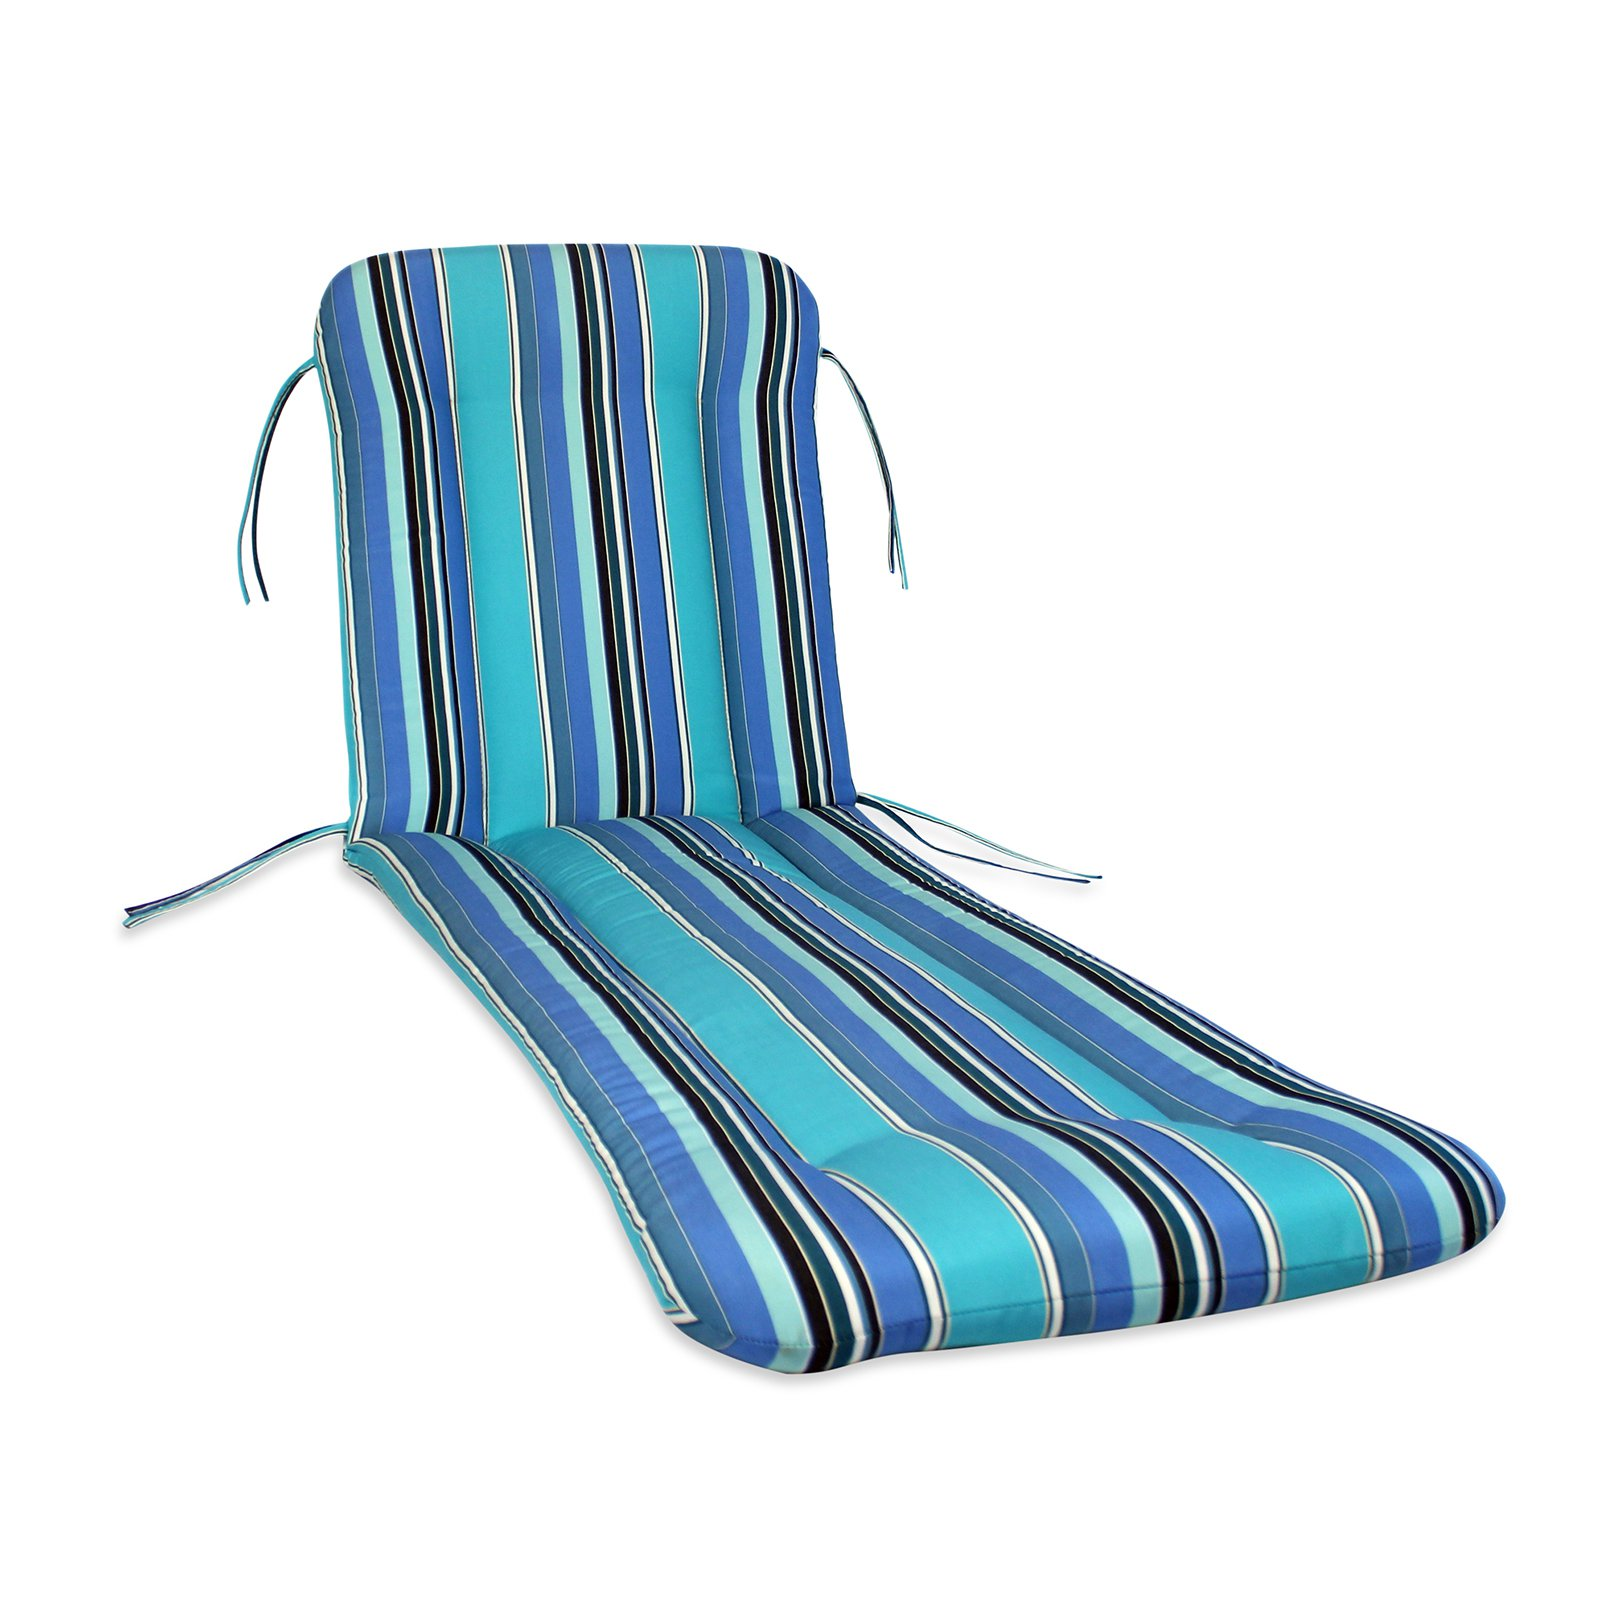 Comfort Classics Sunbrella Chaise Lounge Cushion Walmart Com Walmart Com